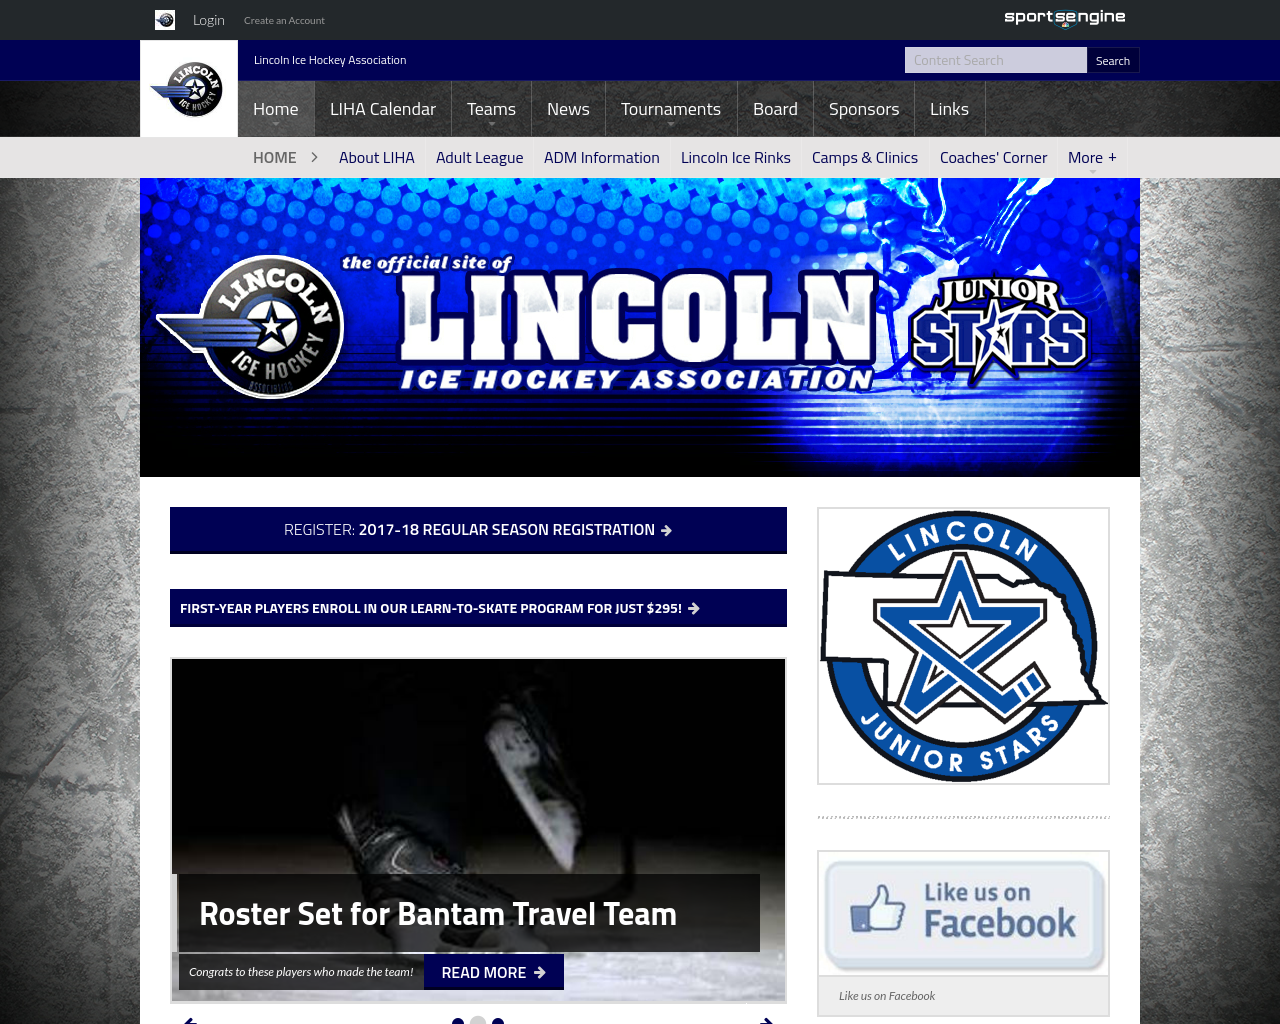 Lincoln-Ice-Hockey-Associaton-Advertising-Reviews-Pricing